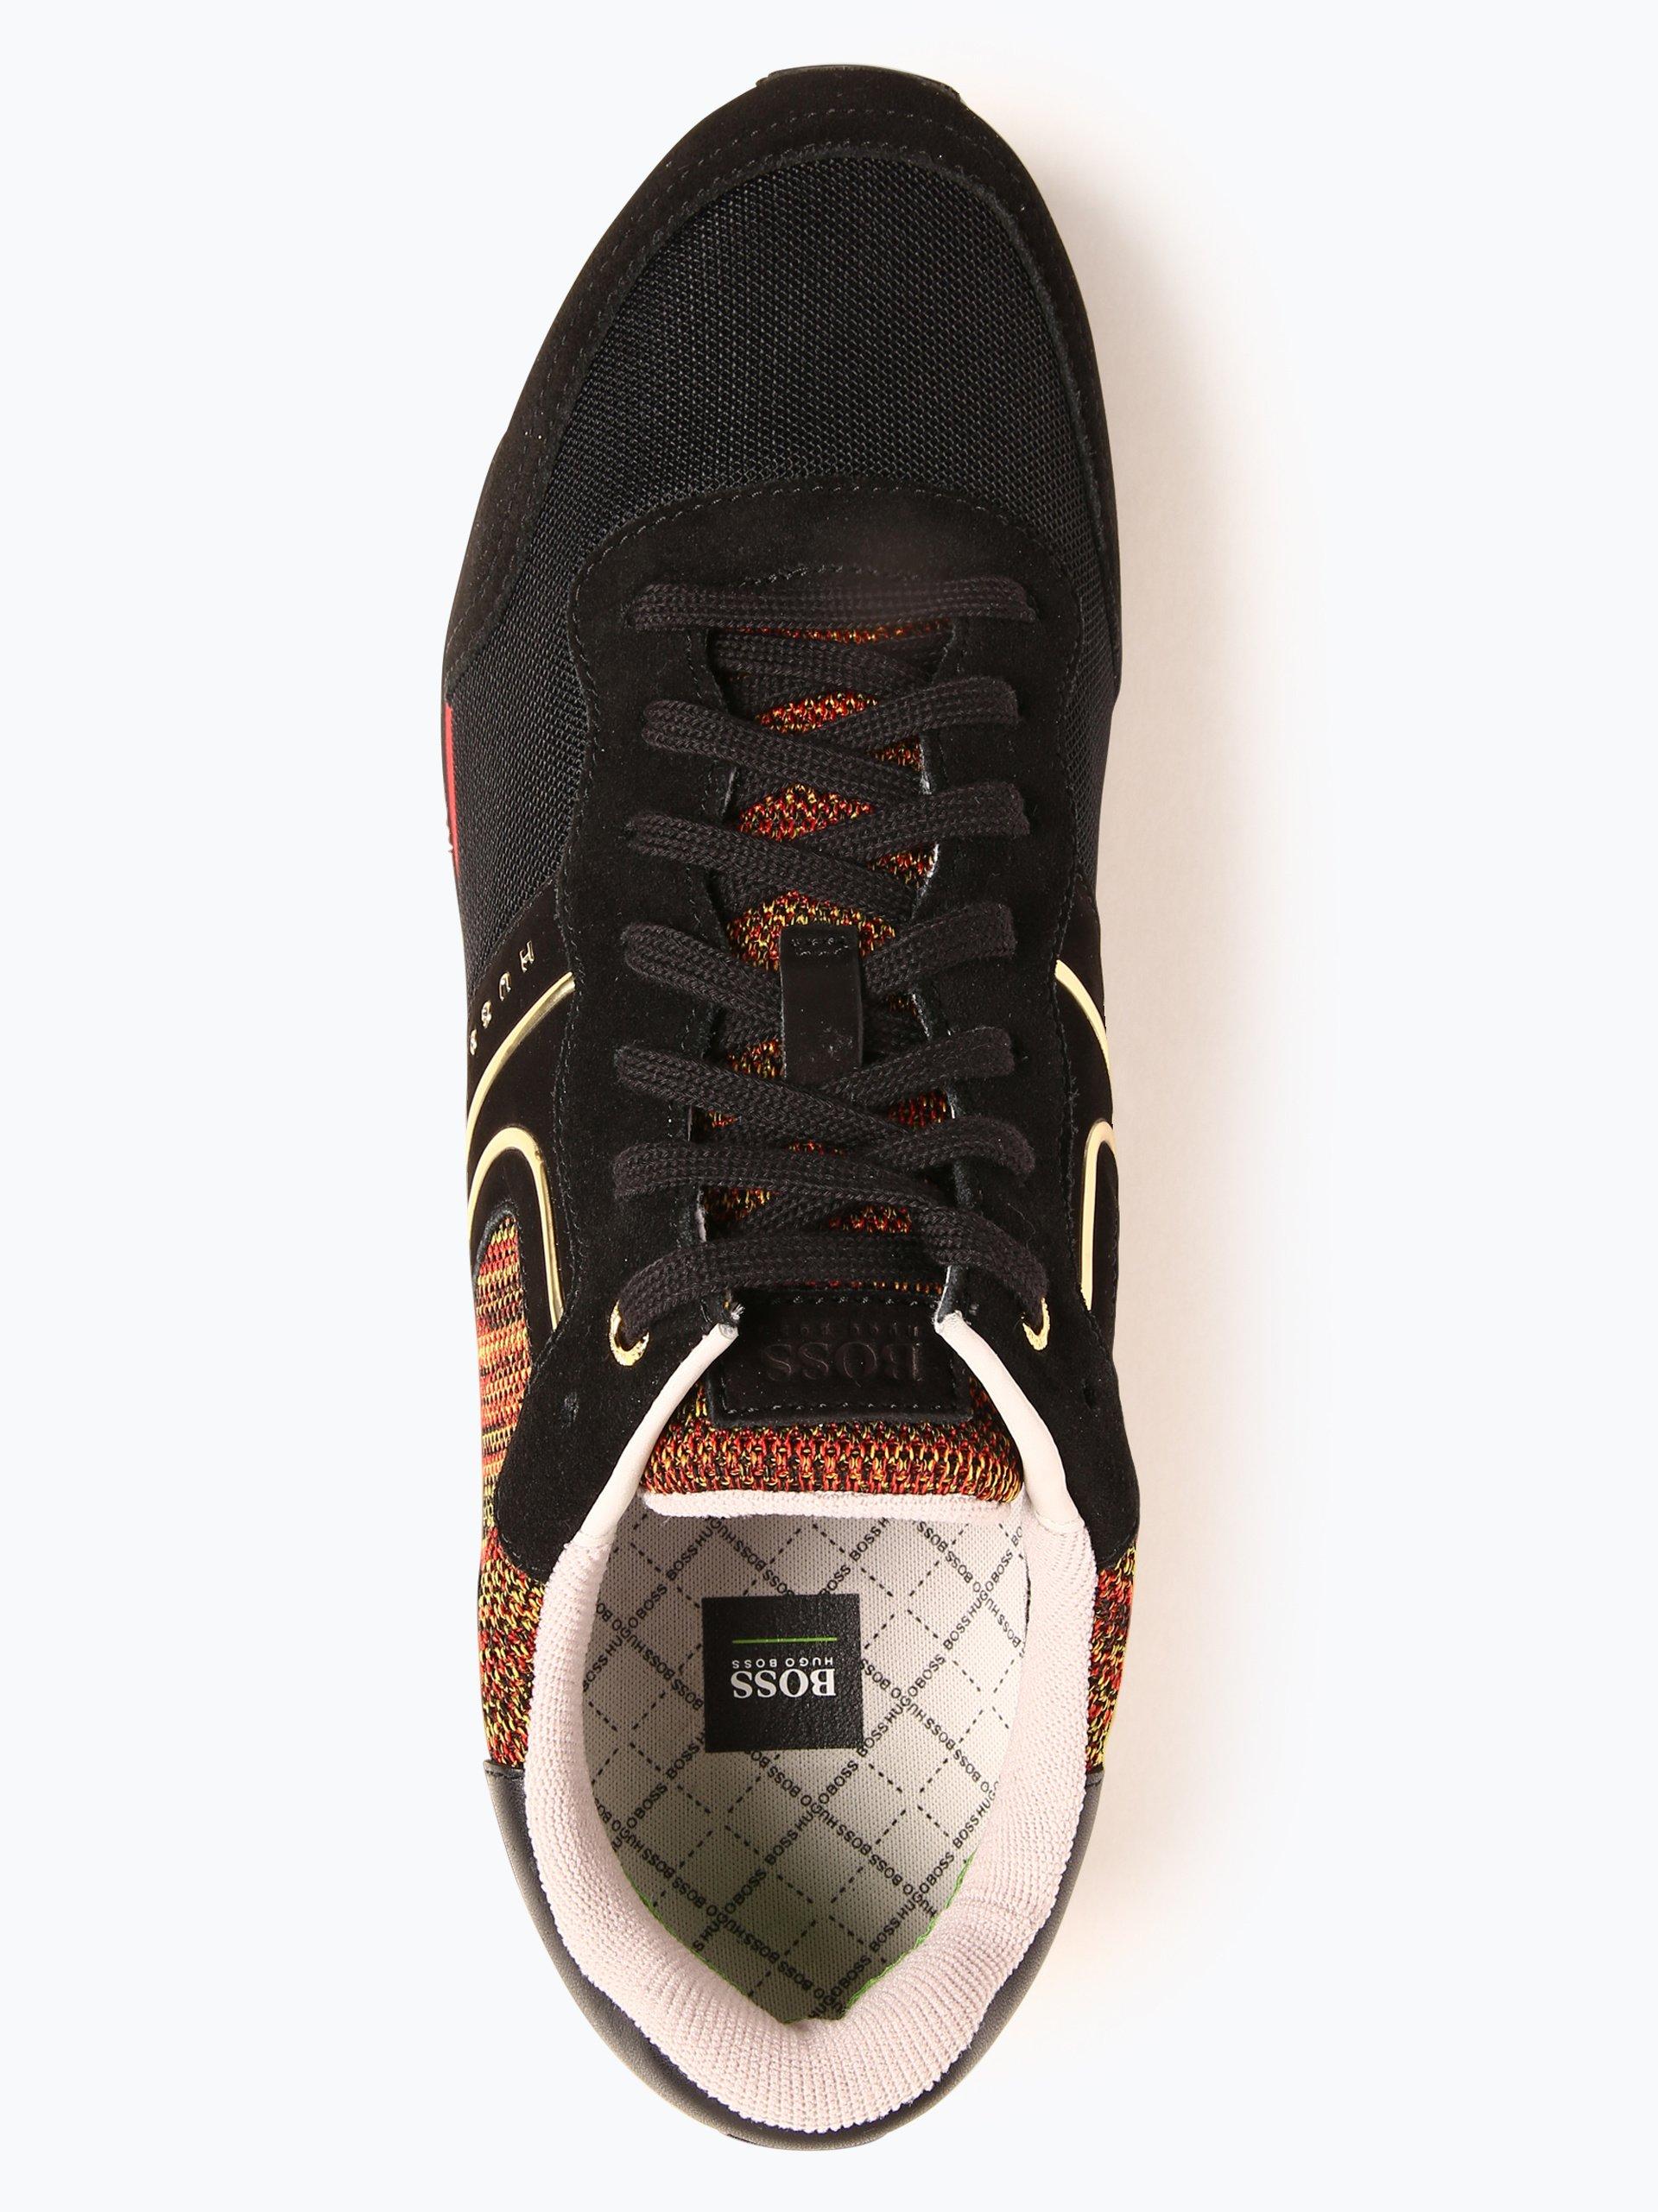 BOSS Menswear Athleisure Tenisówki męskie z dodatkiem skóry – Parkour_Runn_flag